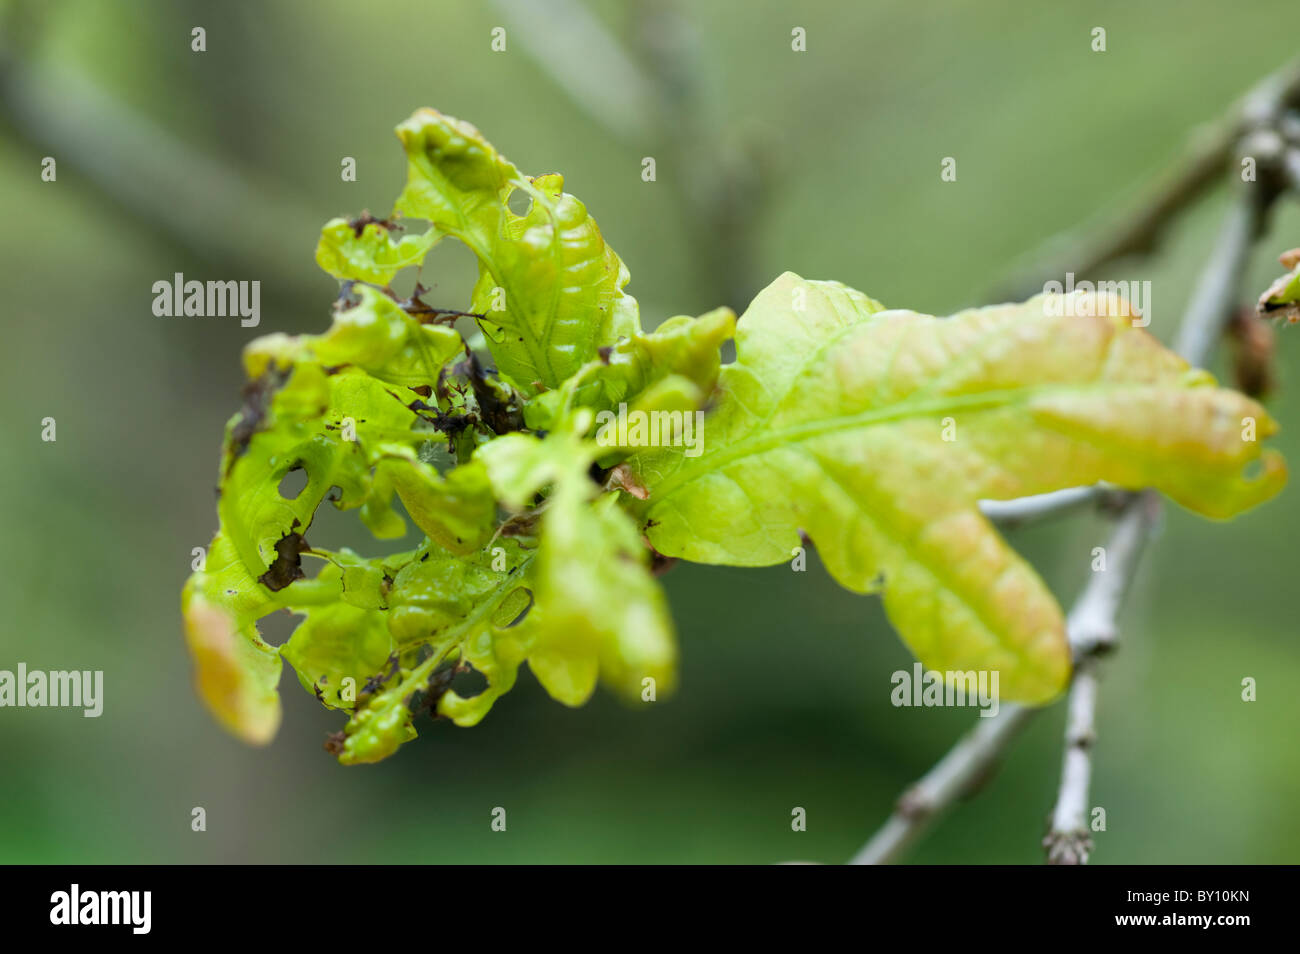 Diseased oak tree leaves - Stock Image